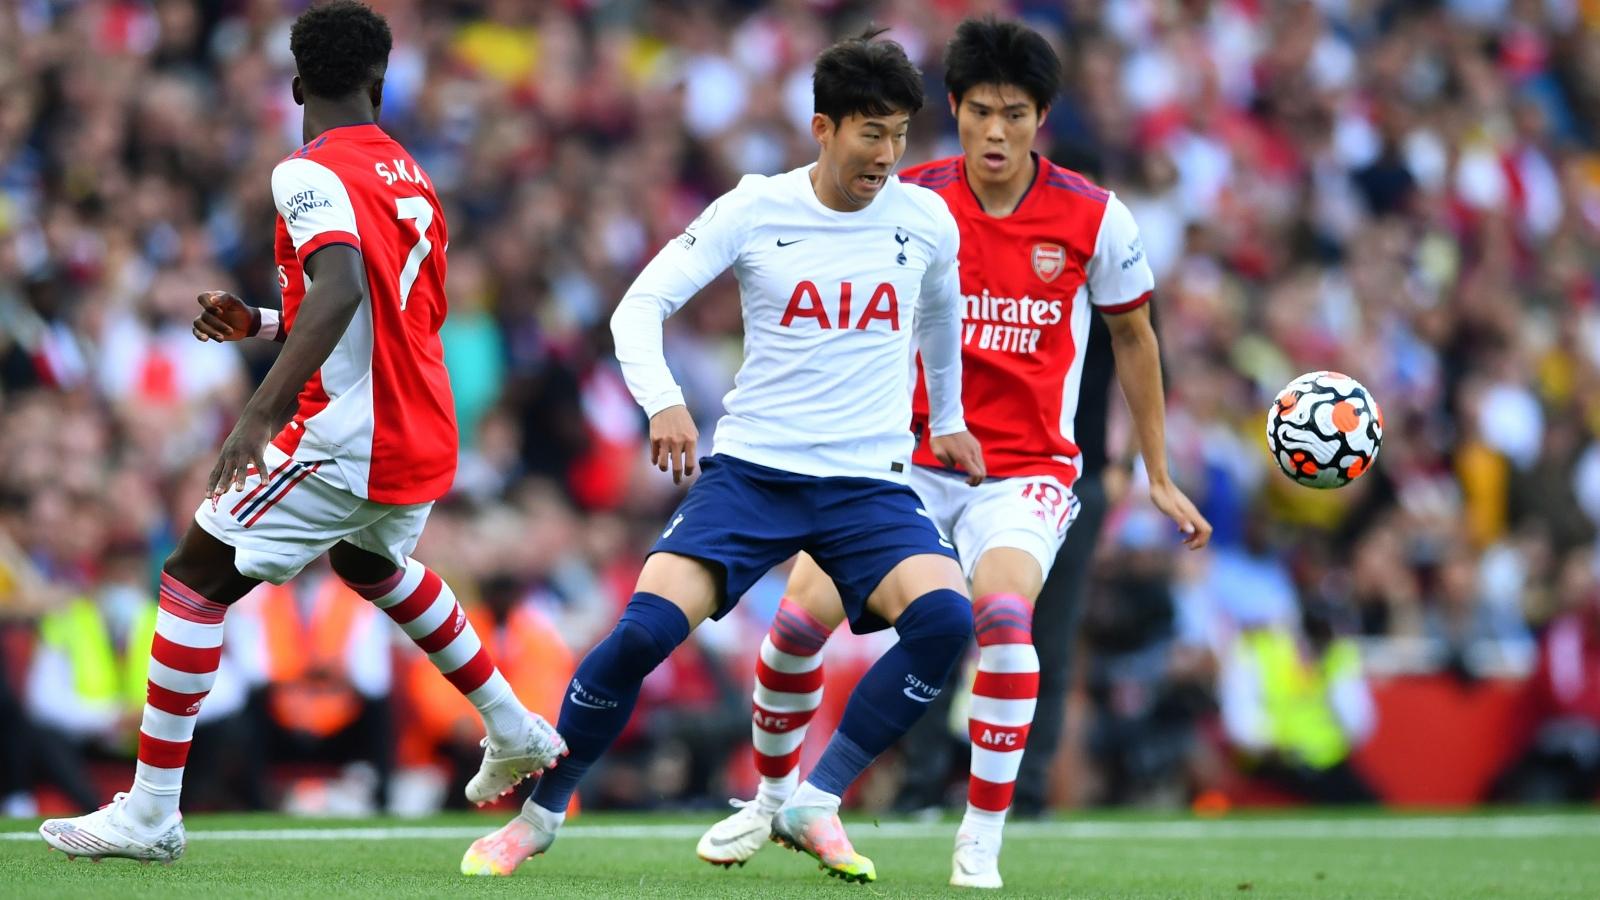 TRỰC TIẾP Arsenal 1-0Tottenham: Smith Rowe tỏa sáng